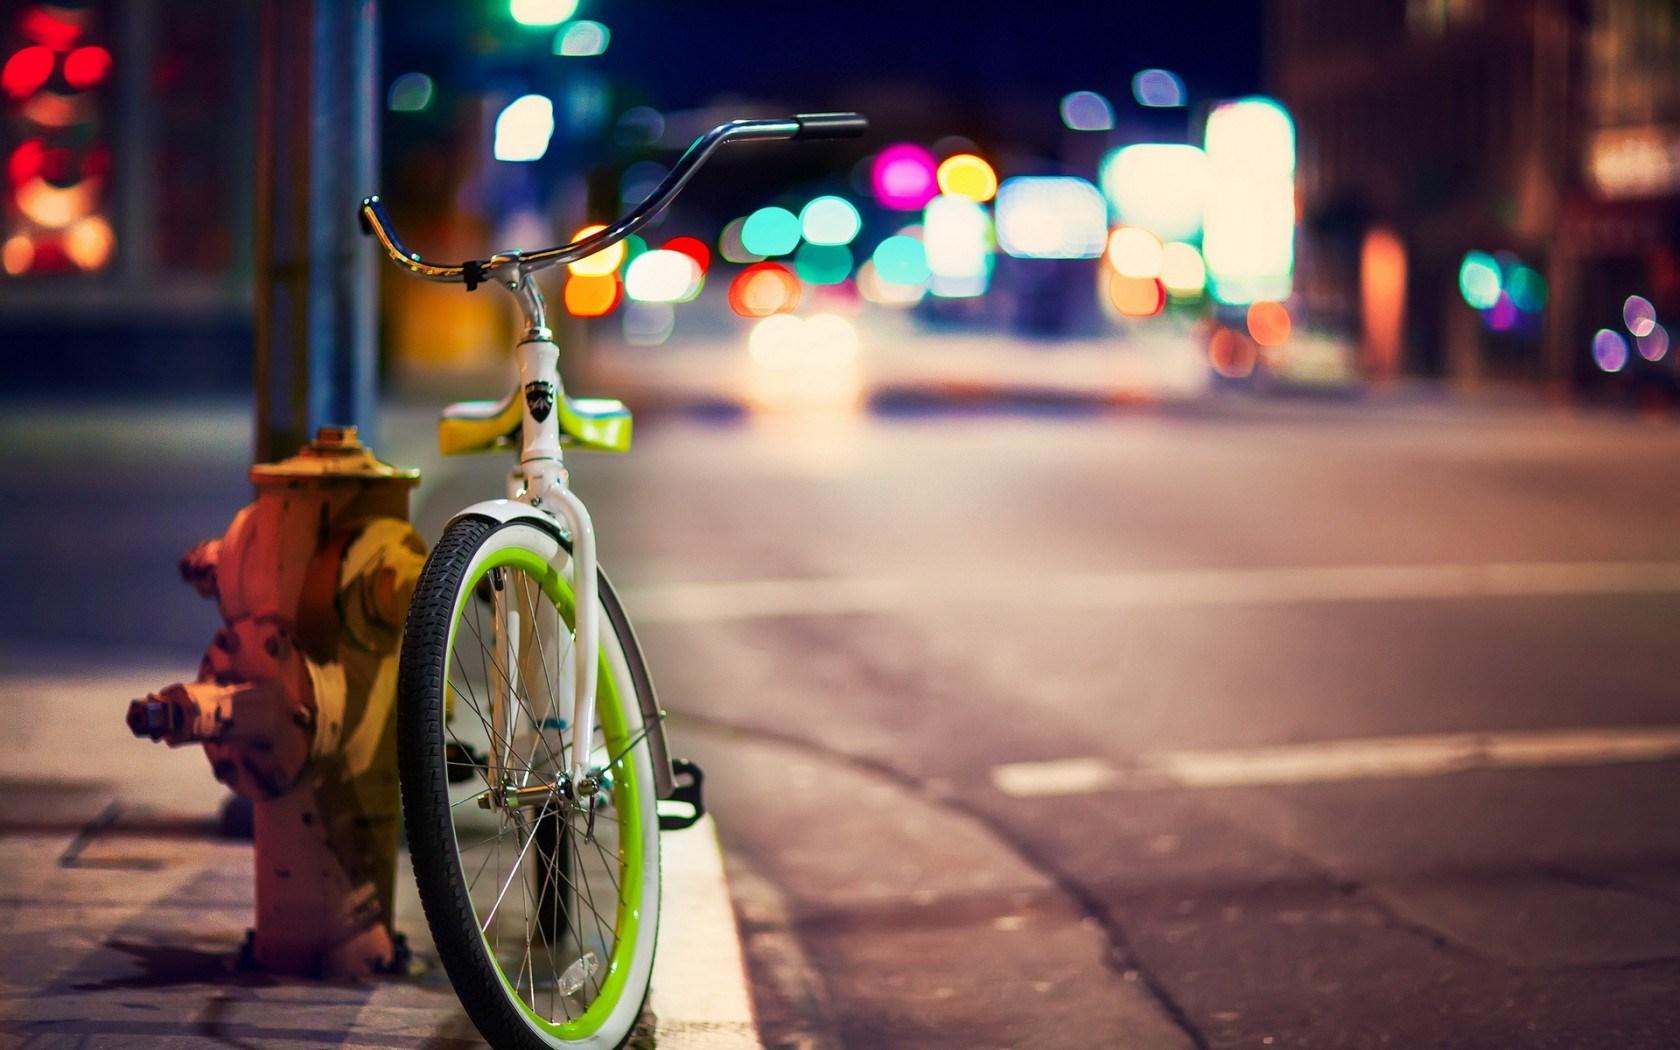 Bicycle City Street Hd Wallpaper